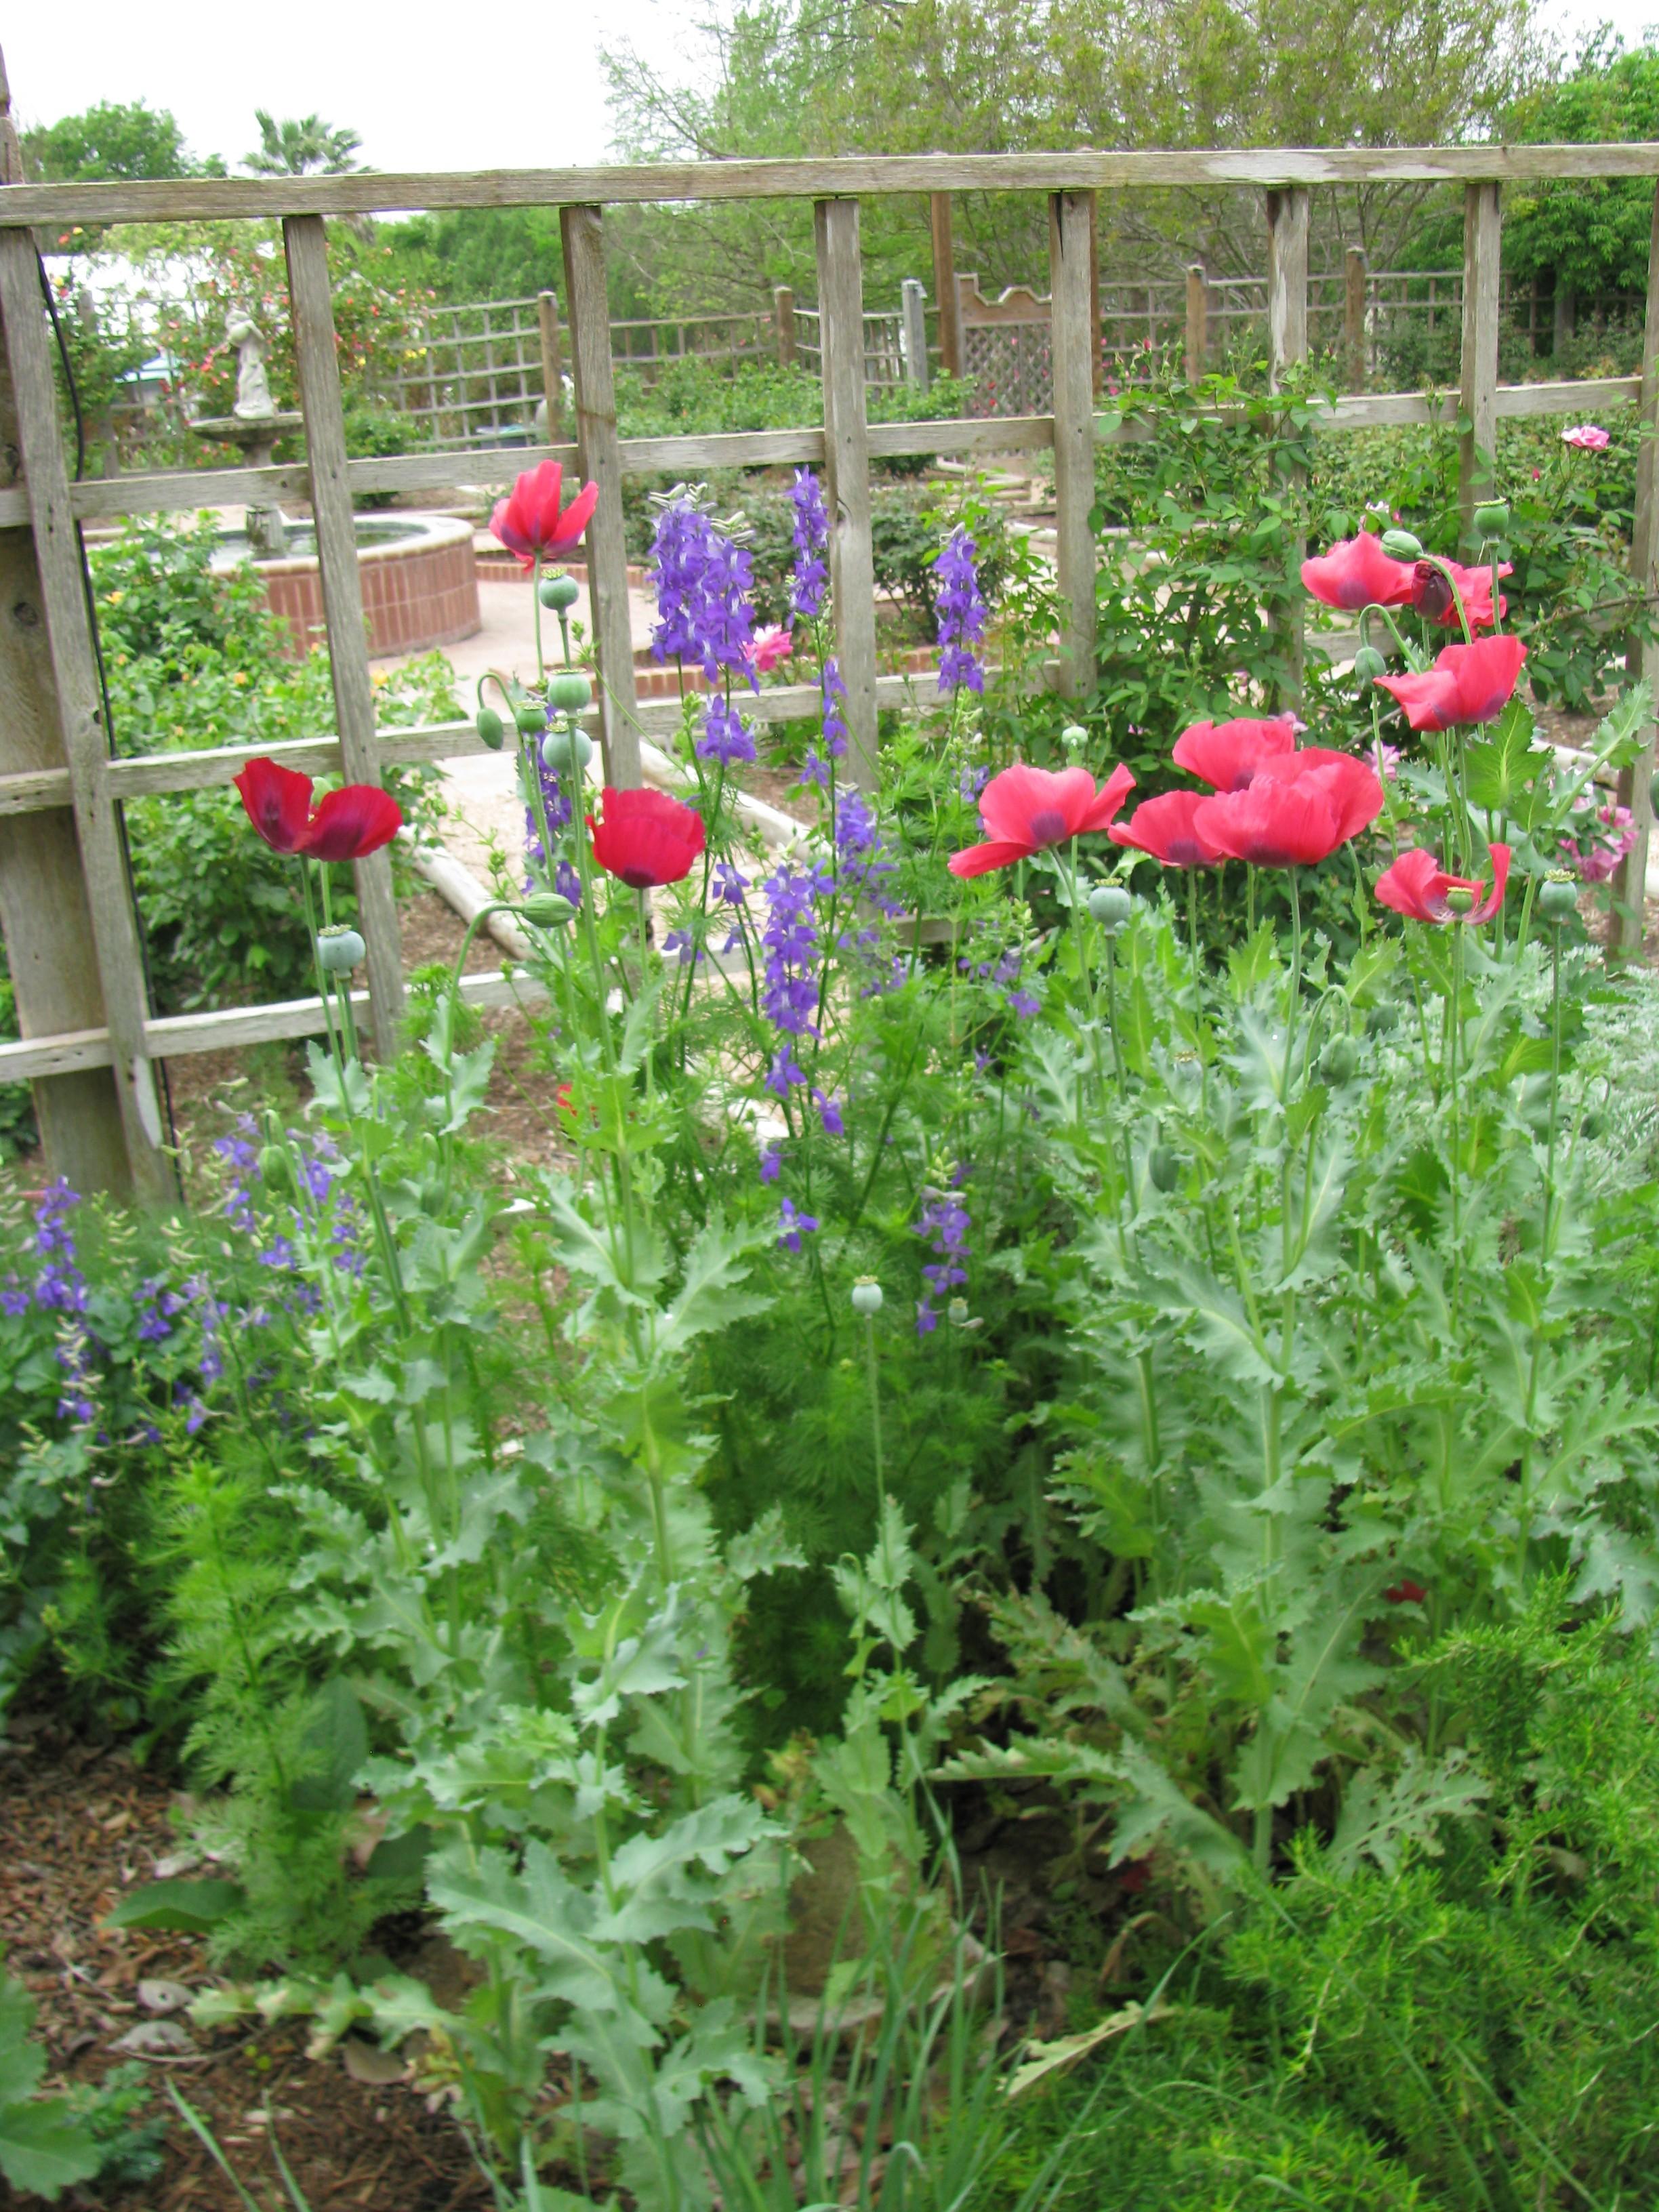 San antonio botanical garden gardendaze s blog